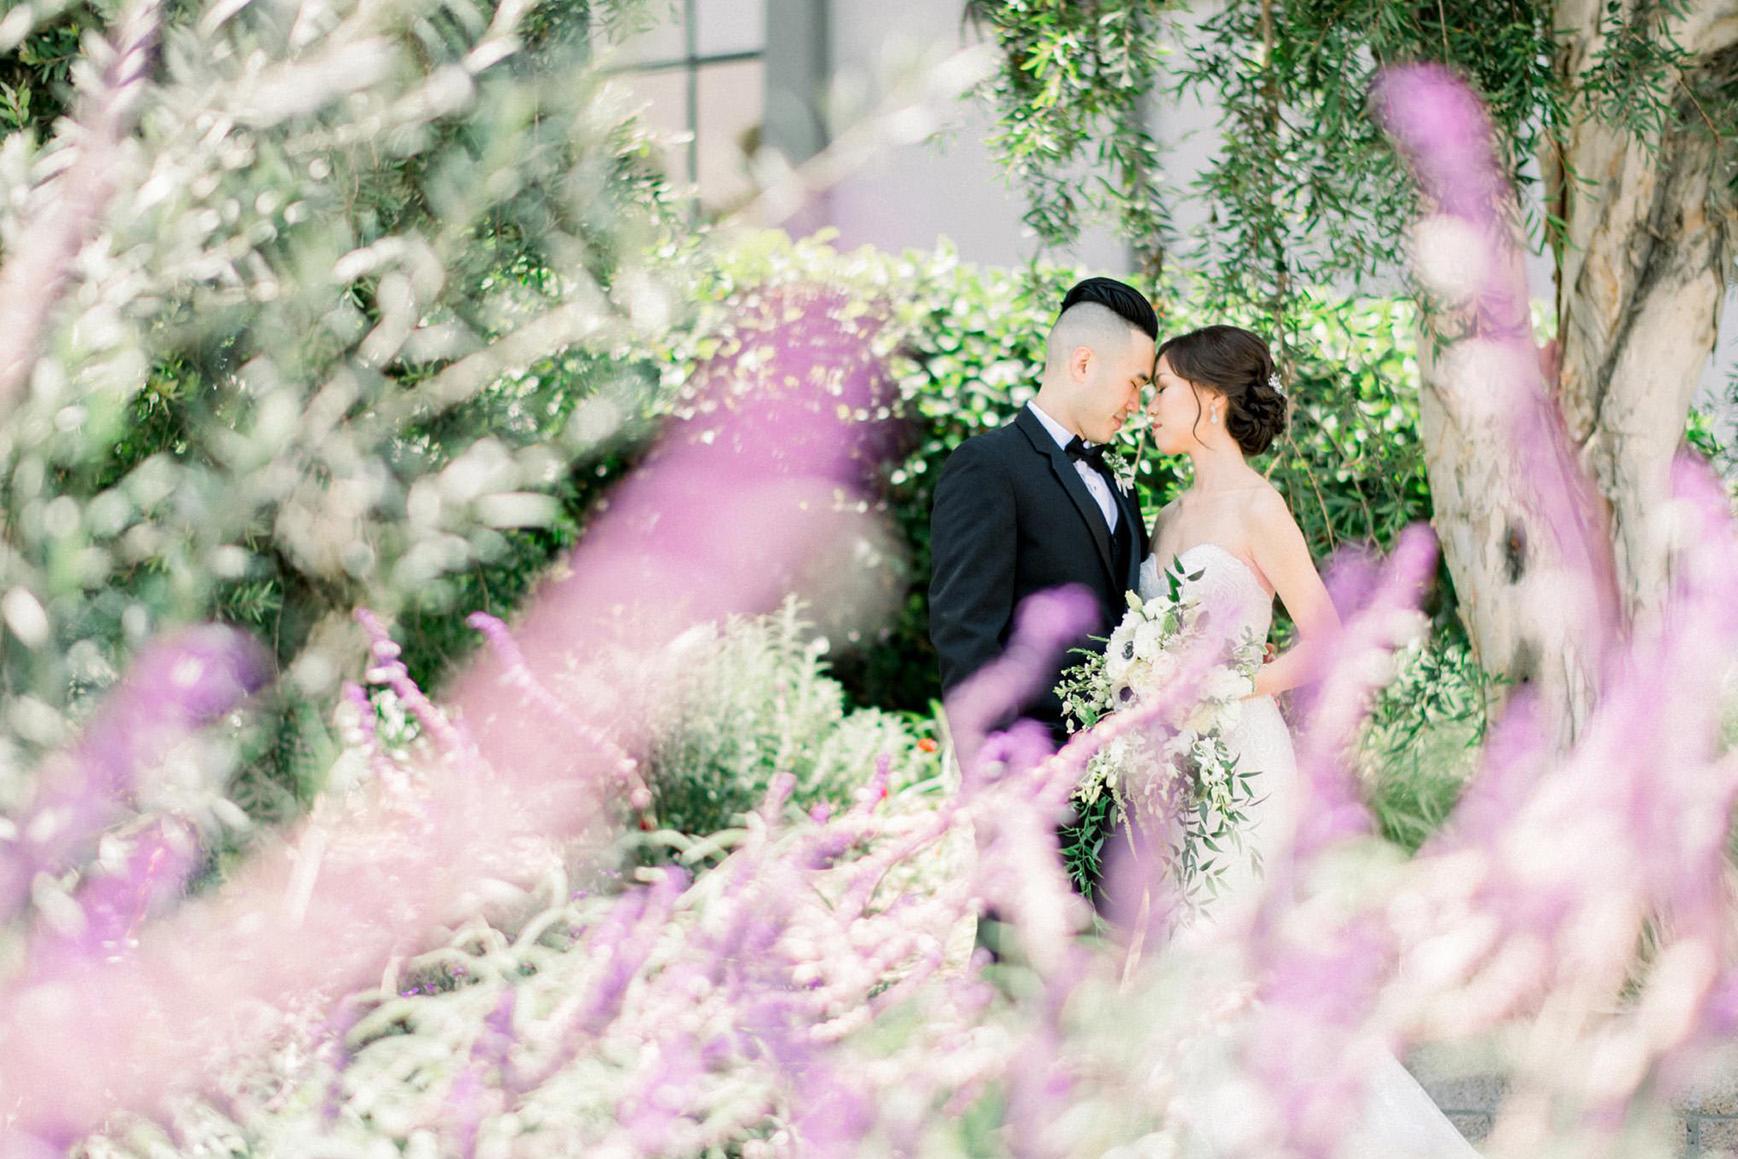 Bride & groom - Rio Hondo - Downey, California - Los Angeles County - Wedgewood Weddings